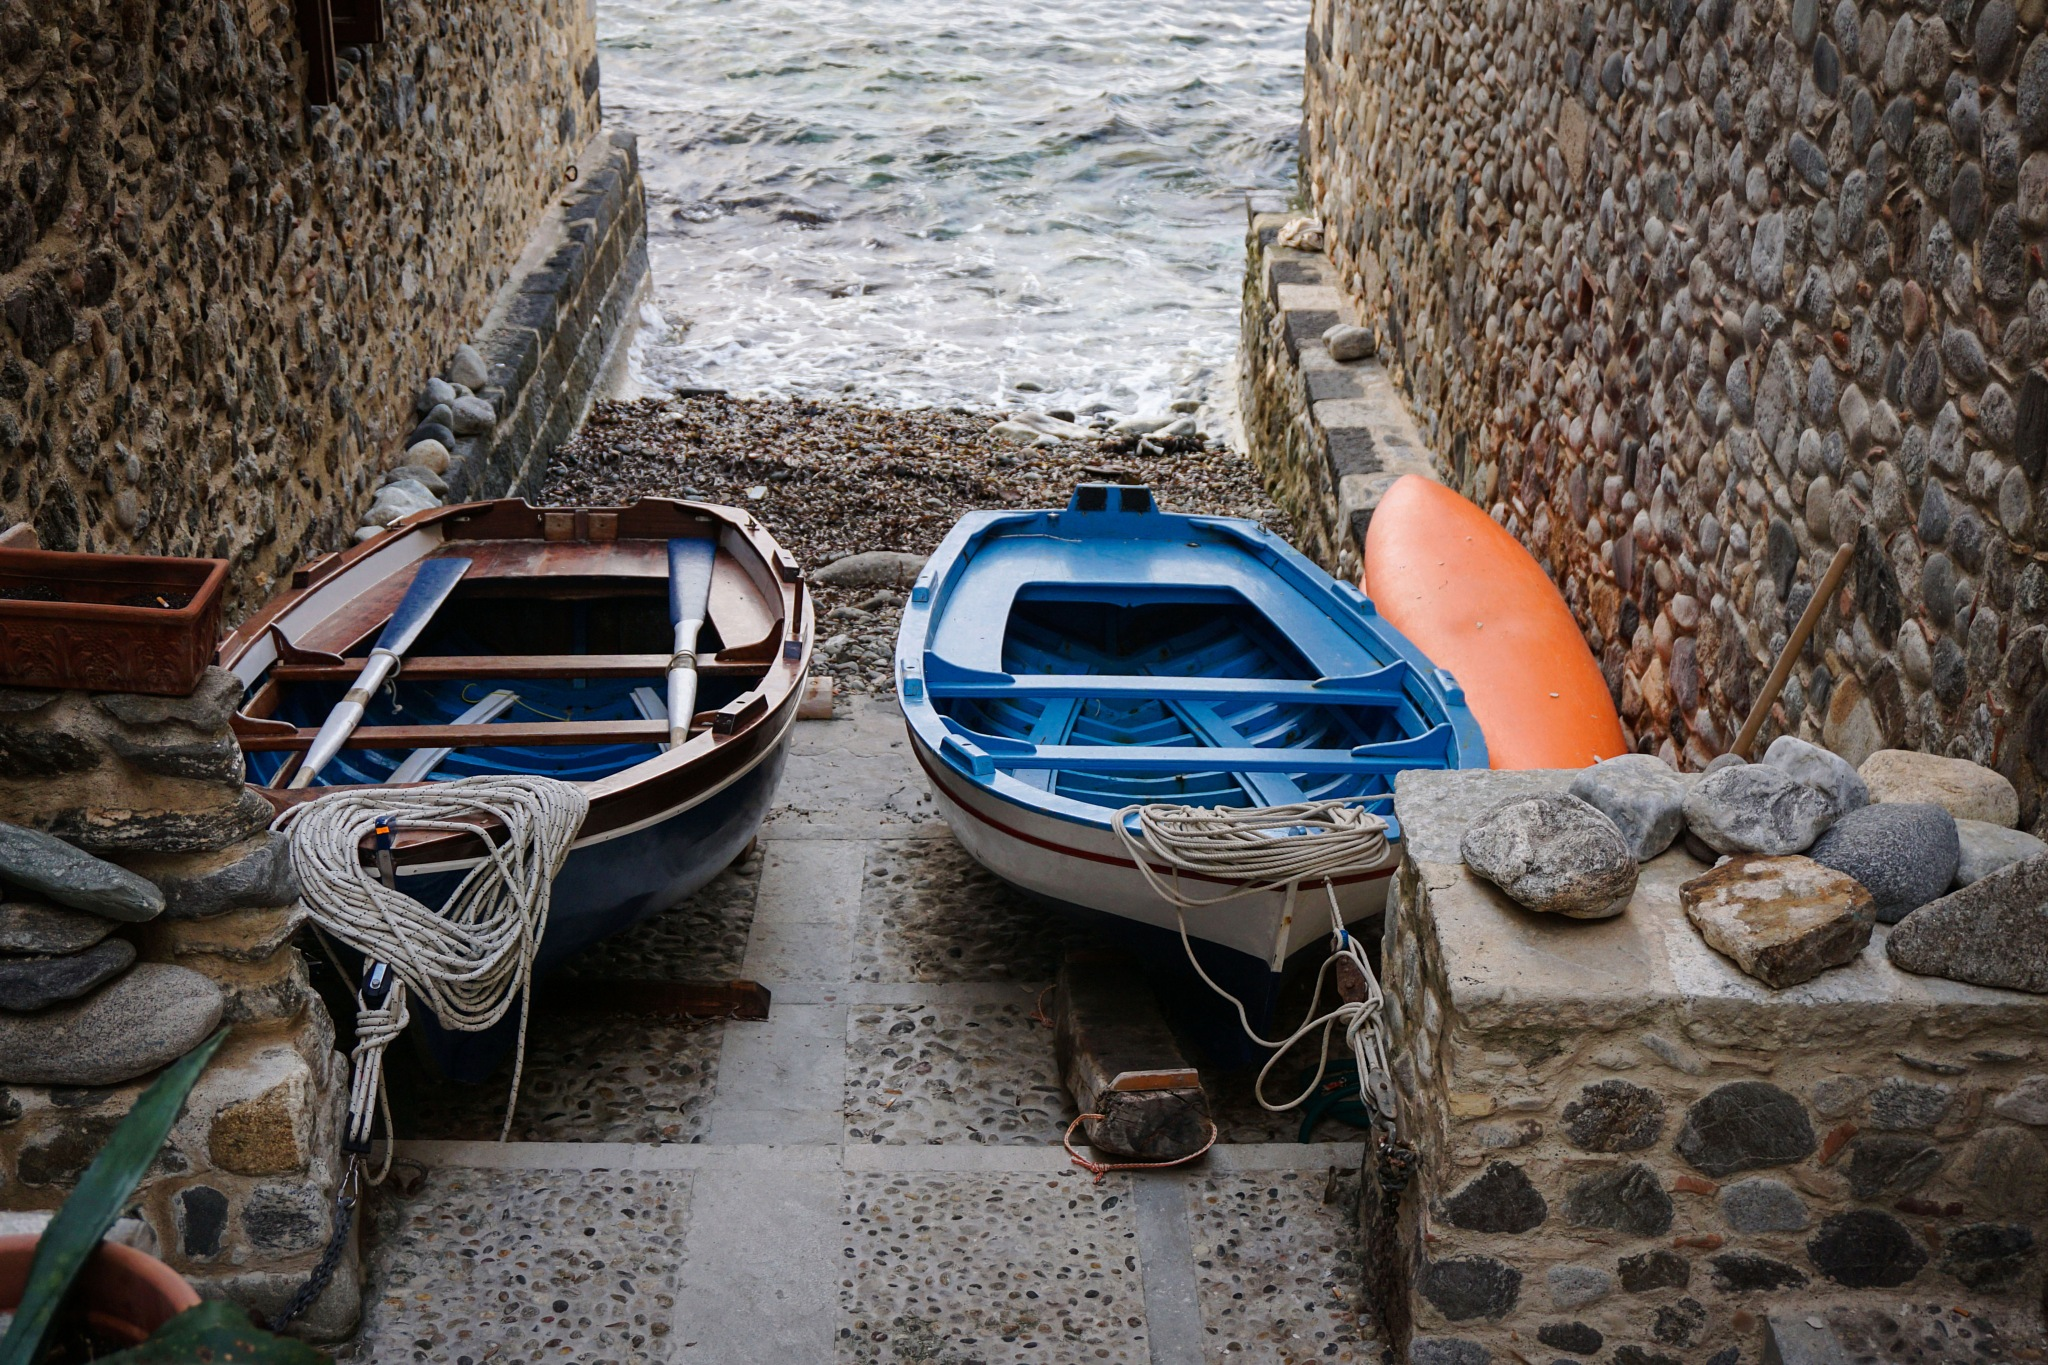 Barche  by francy nikol